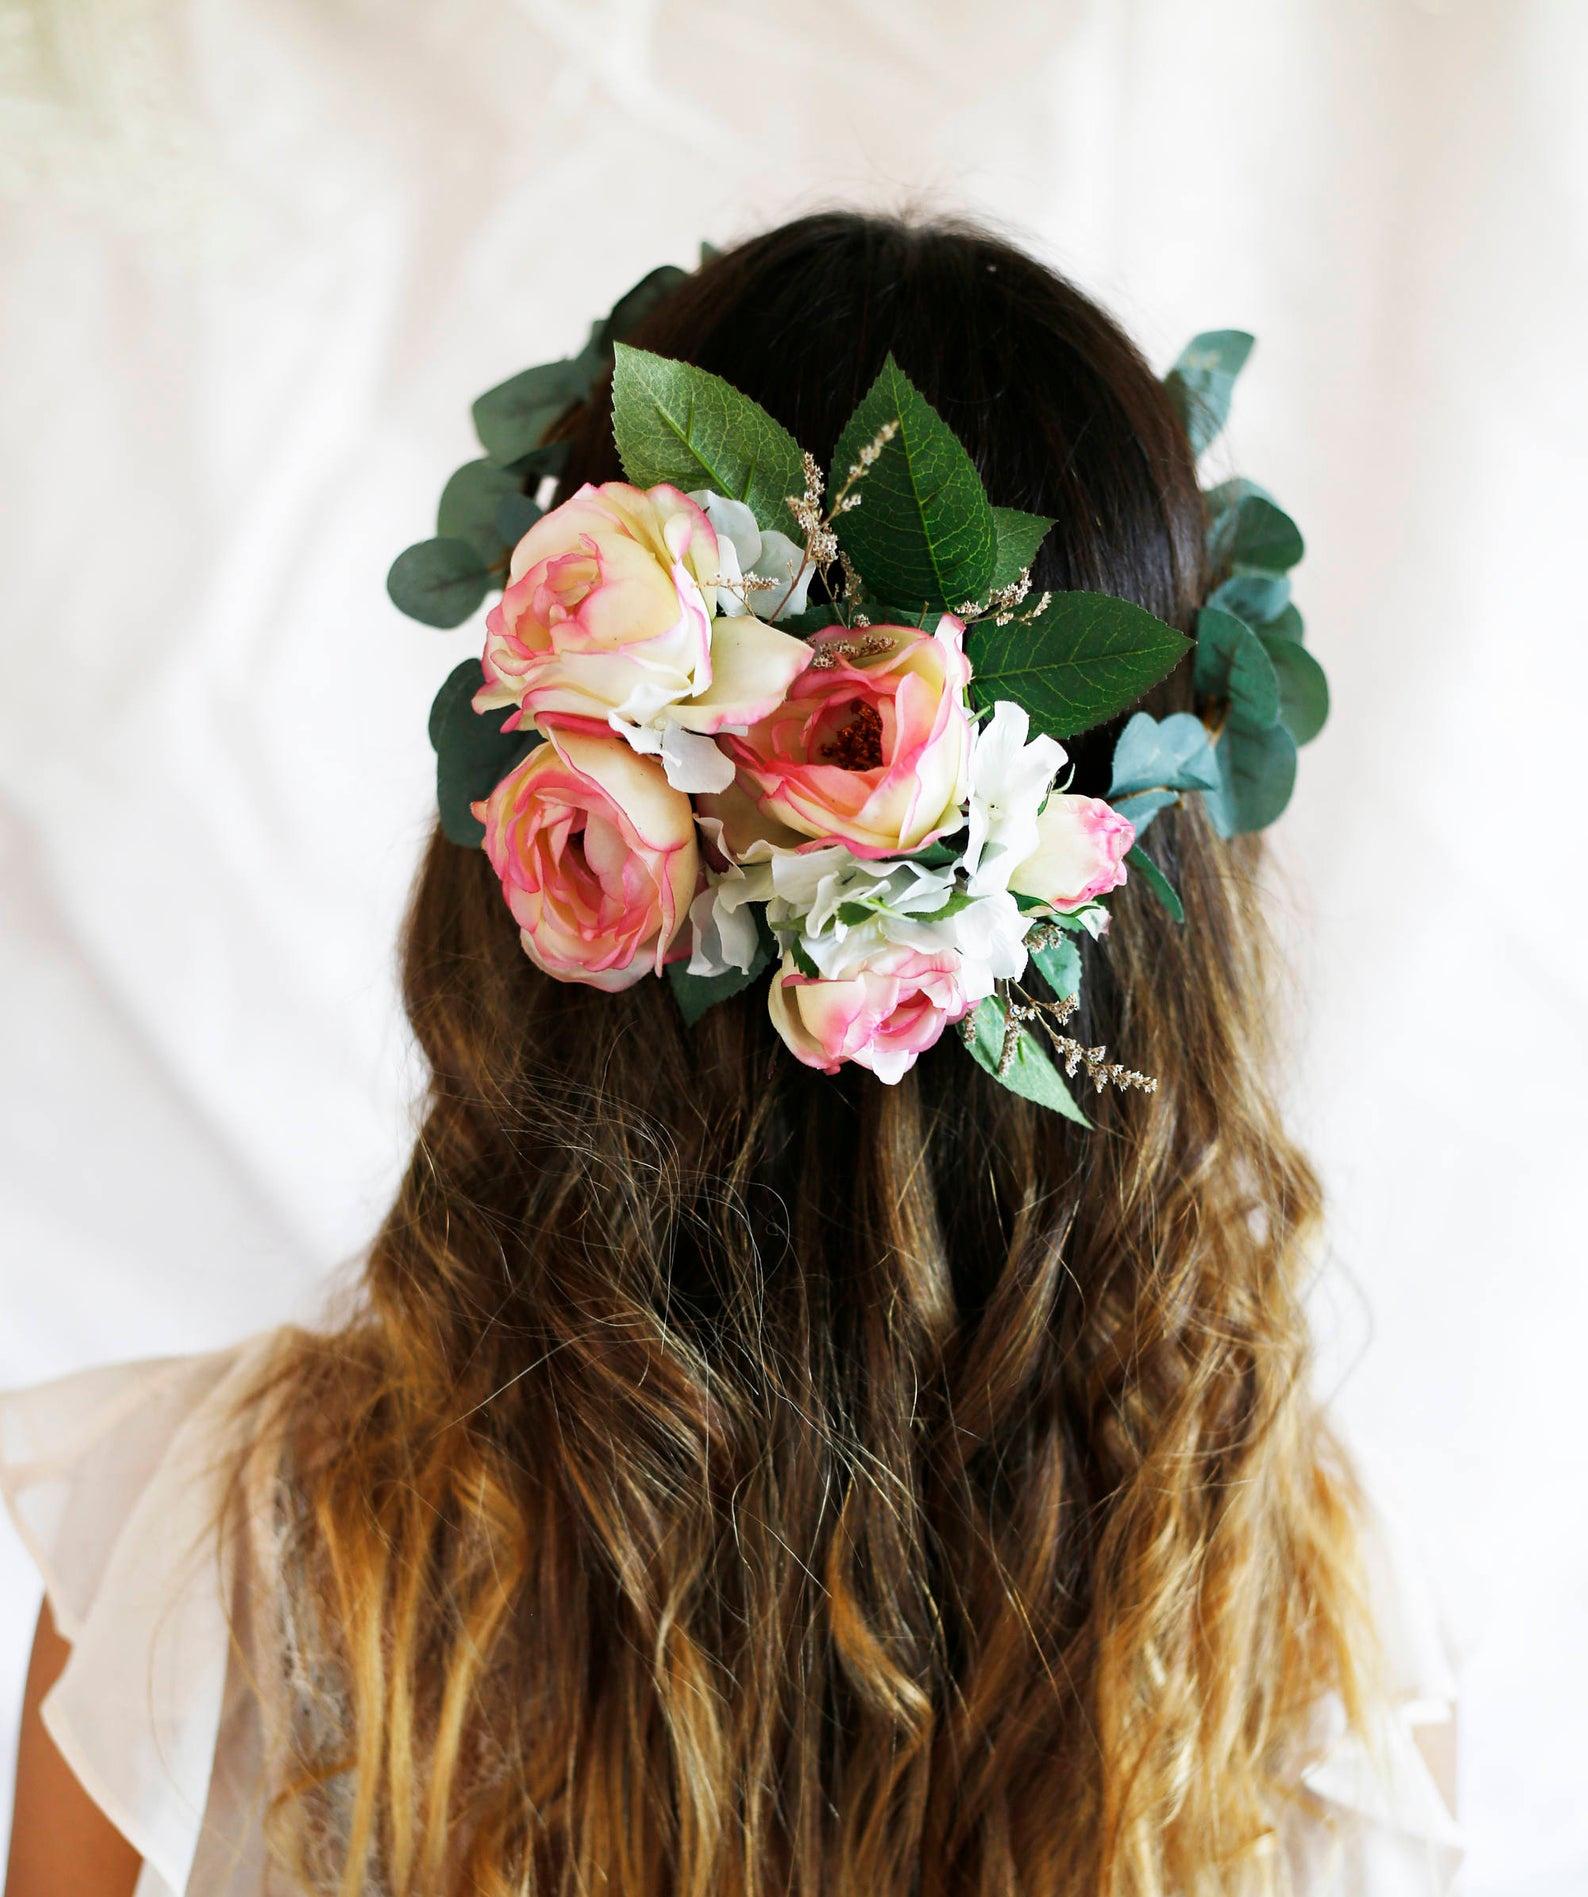 Flower Crowns By Bridal Wish Design